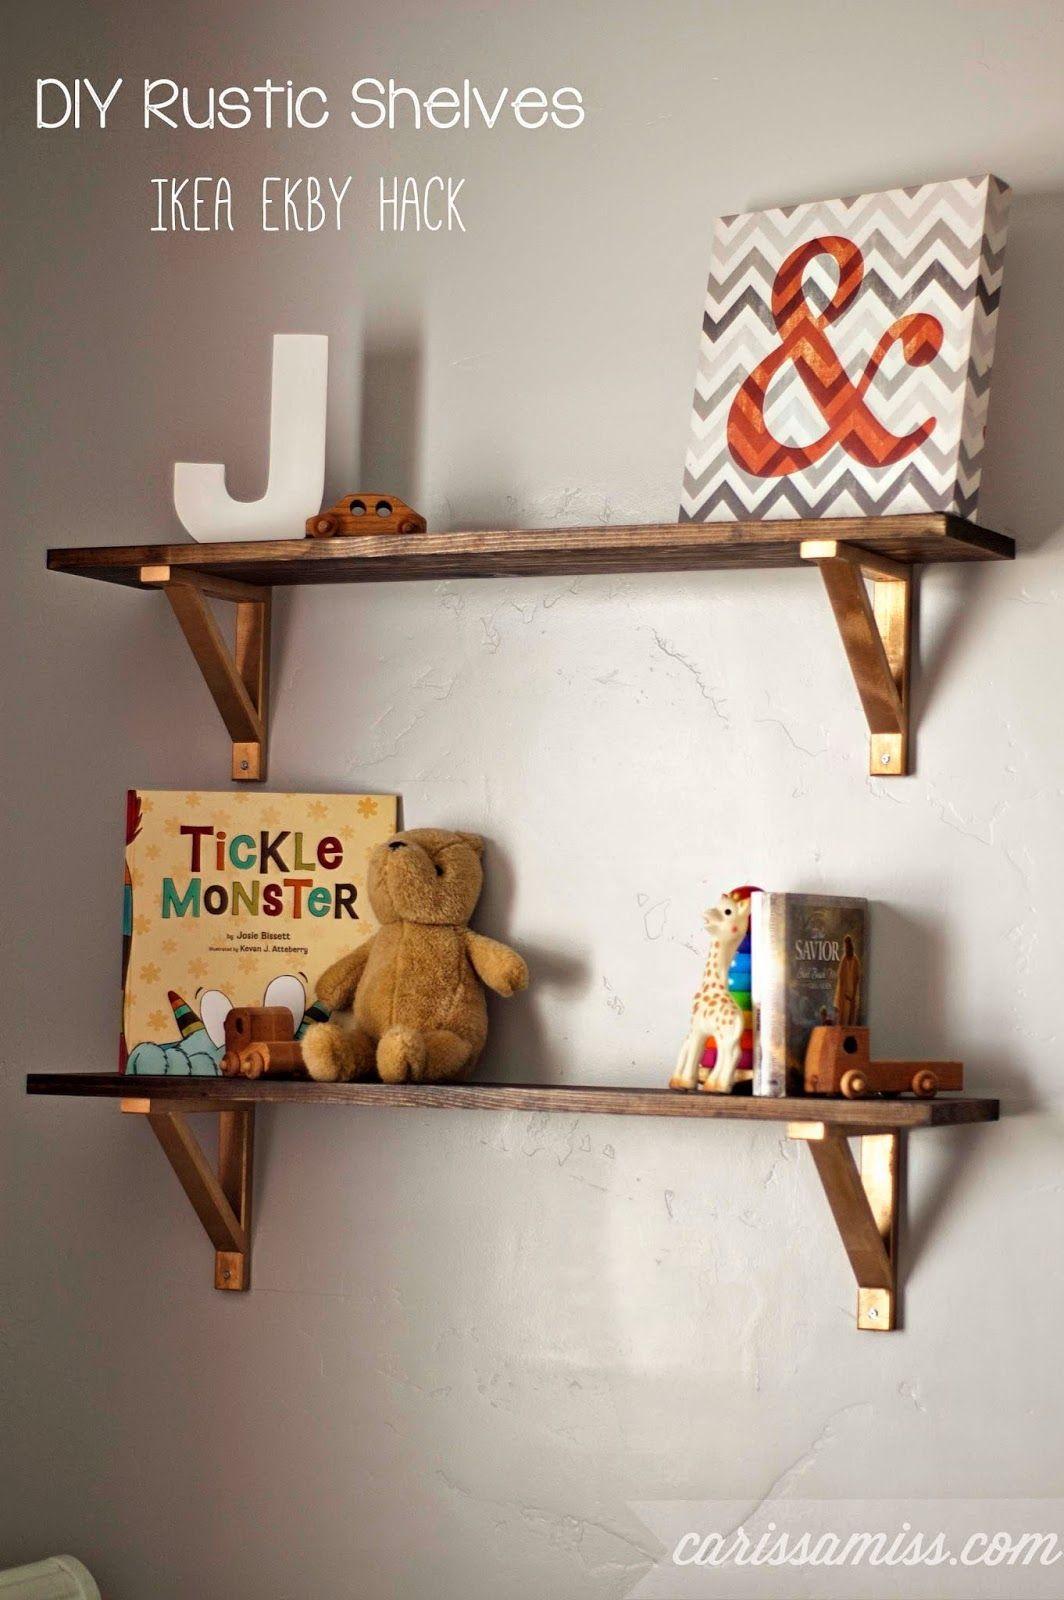 Ikea ekby wood Shelf Brackets Ikea Hacks Ikea ekby